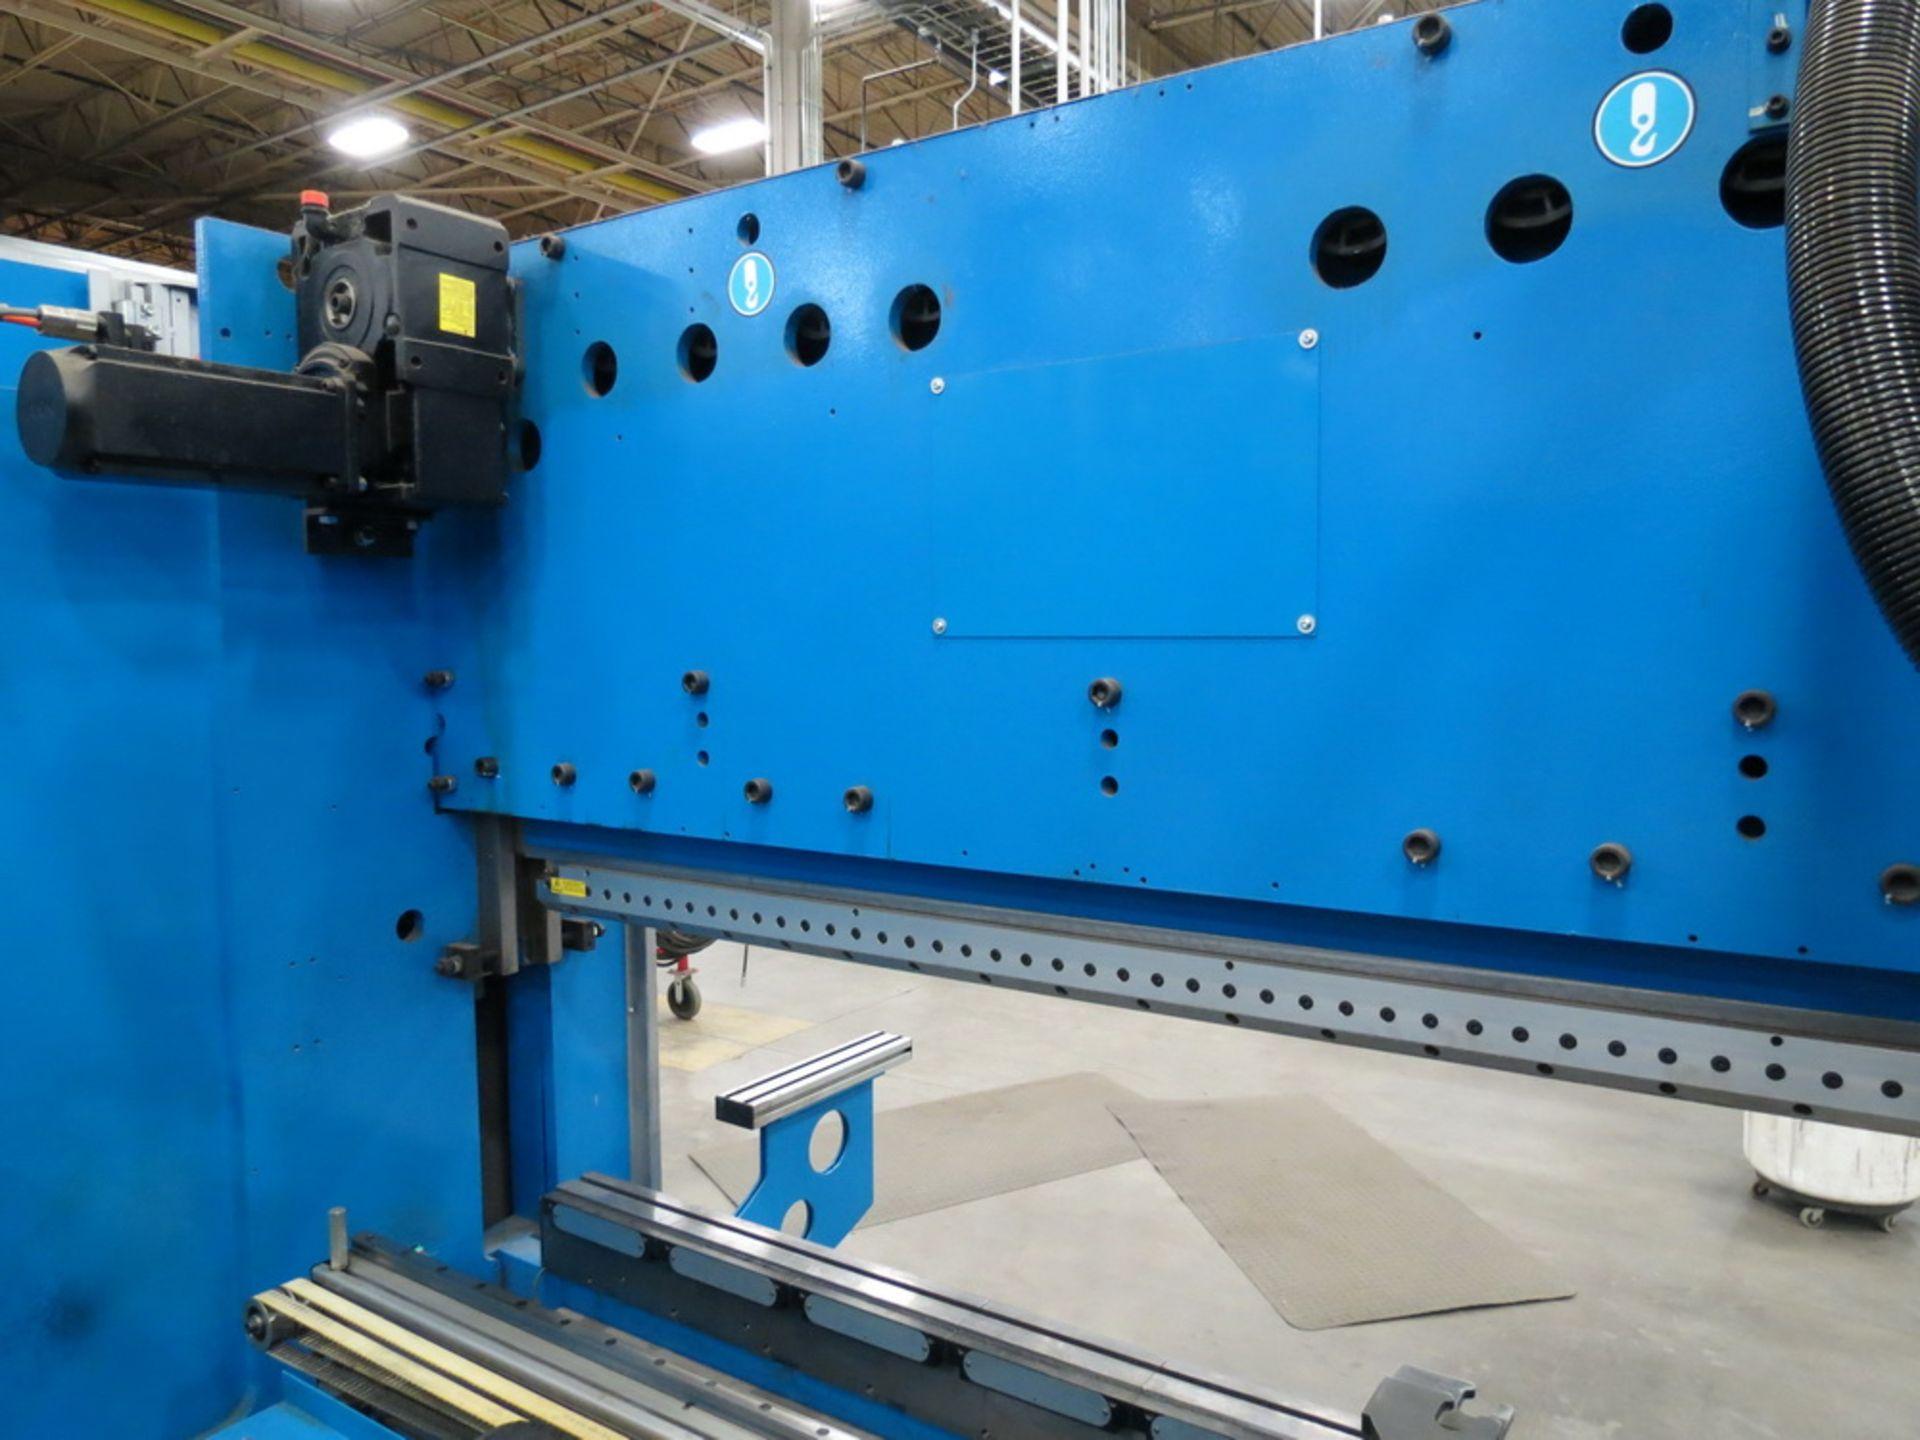 Lot 56 - 2014 Prima EP0520 2 Meter Electric Servo Press Brake